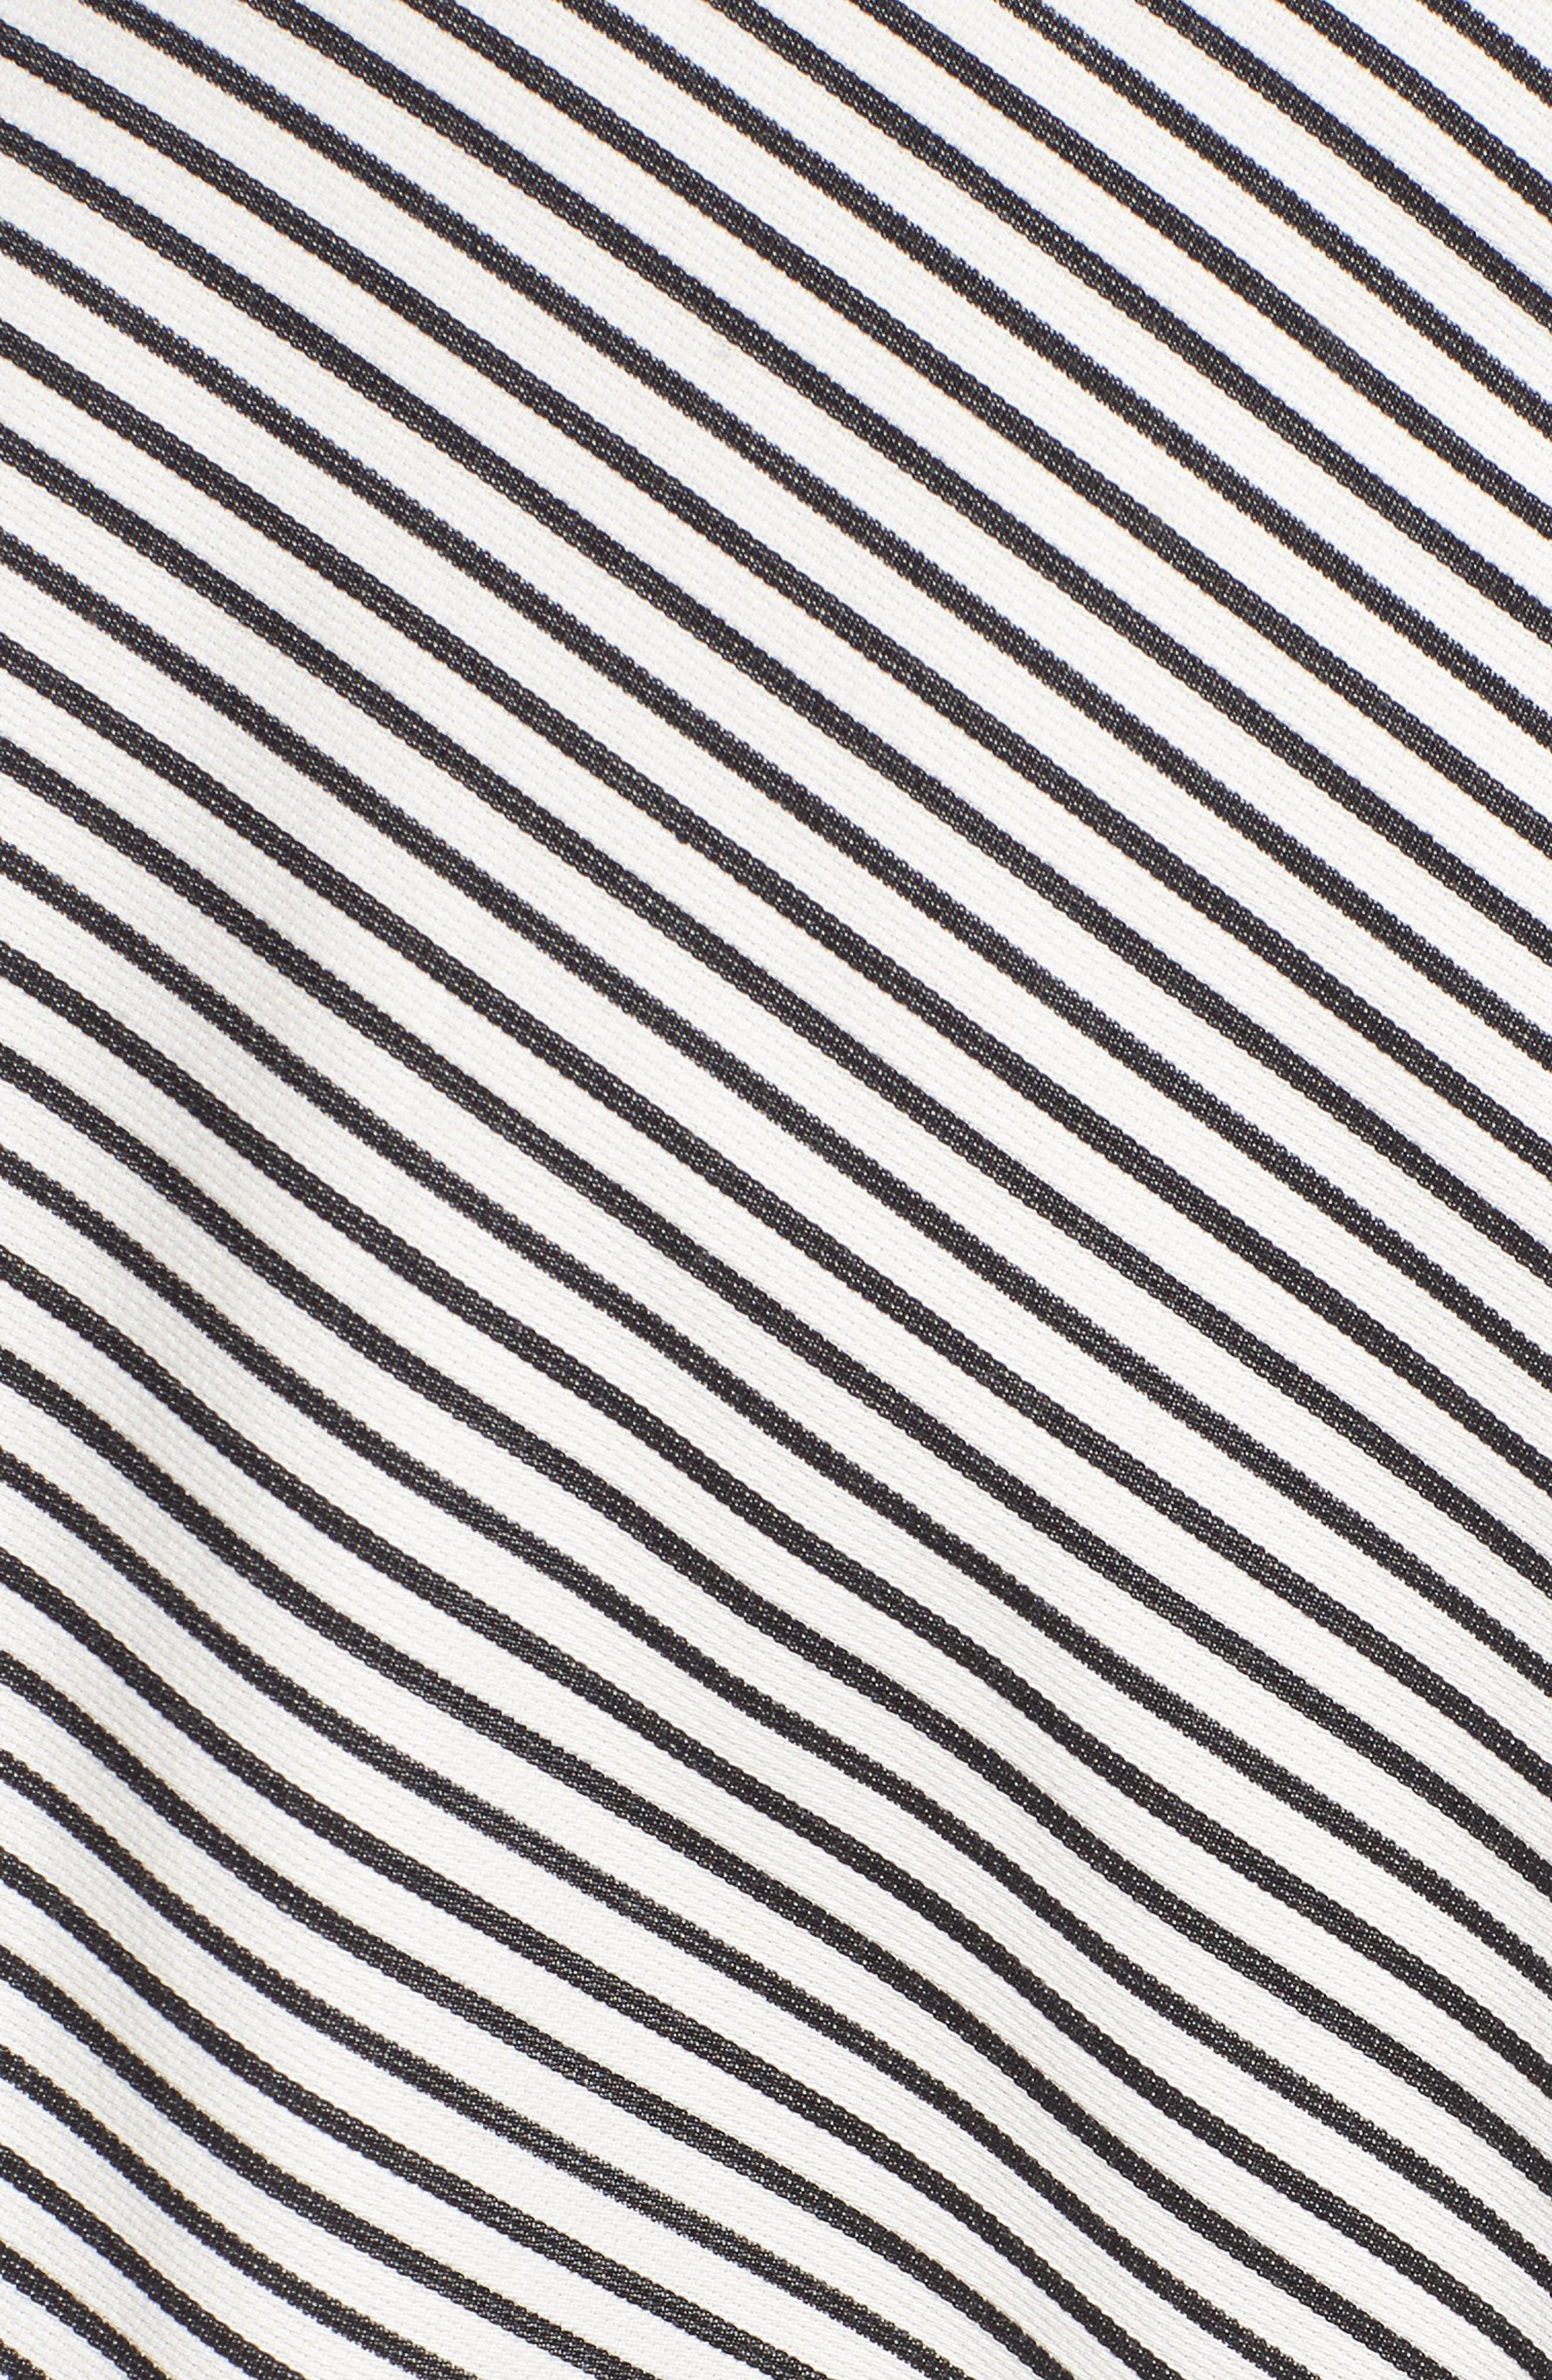 Stripe Pleat Shirt,                             Alternate thumbnail 6, color,                             BLACK/ WHITE PIN STRIPE